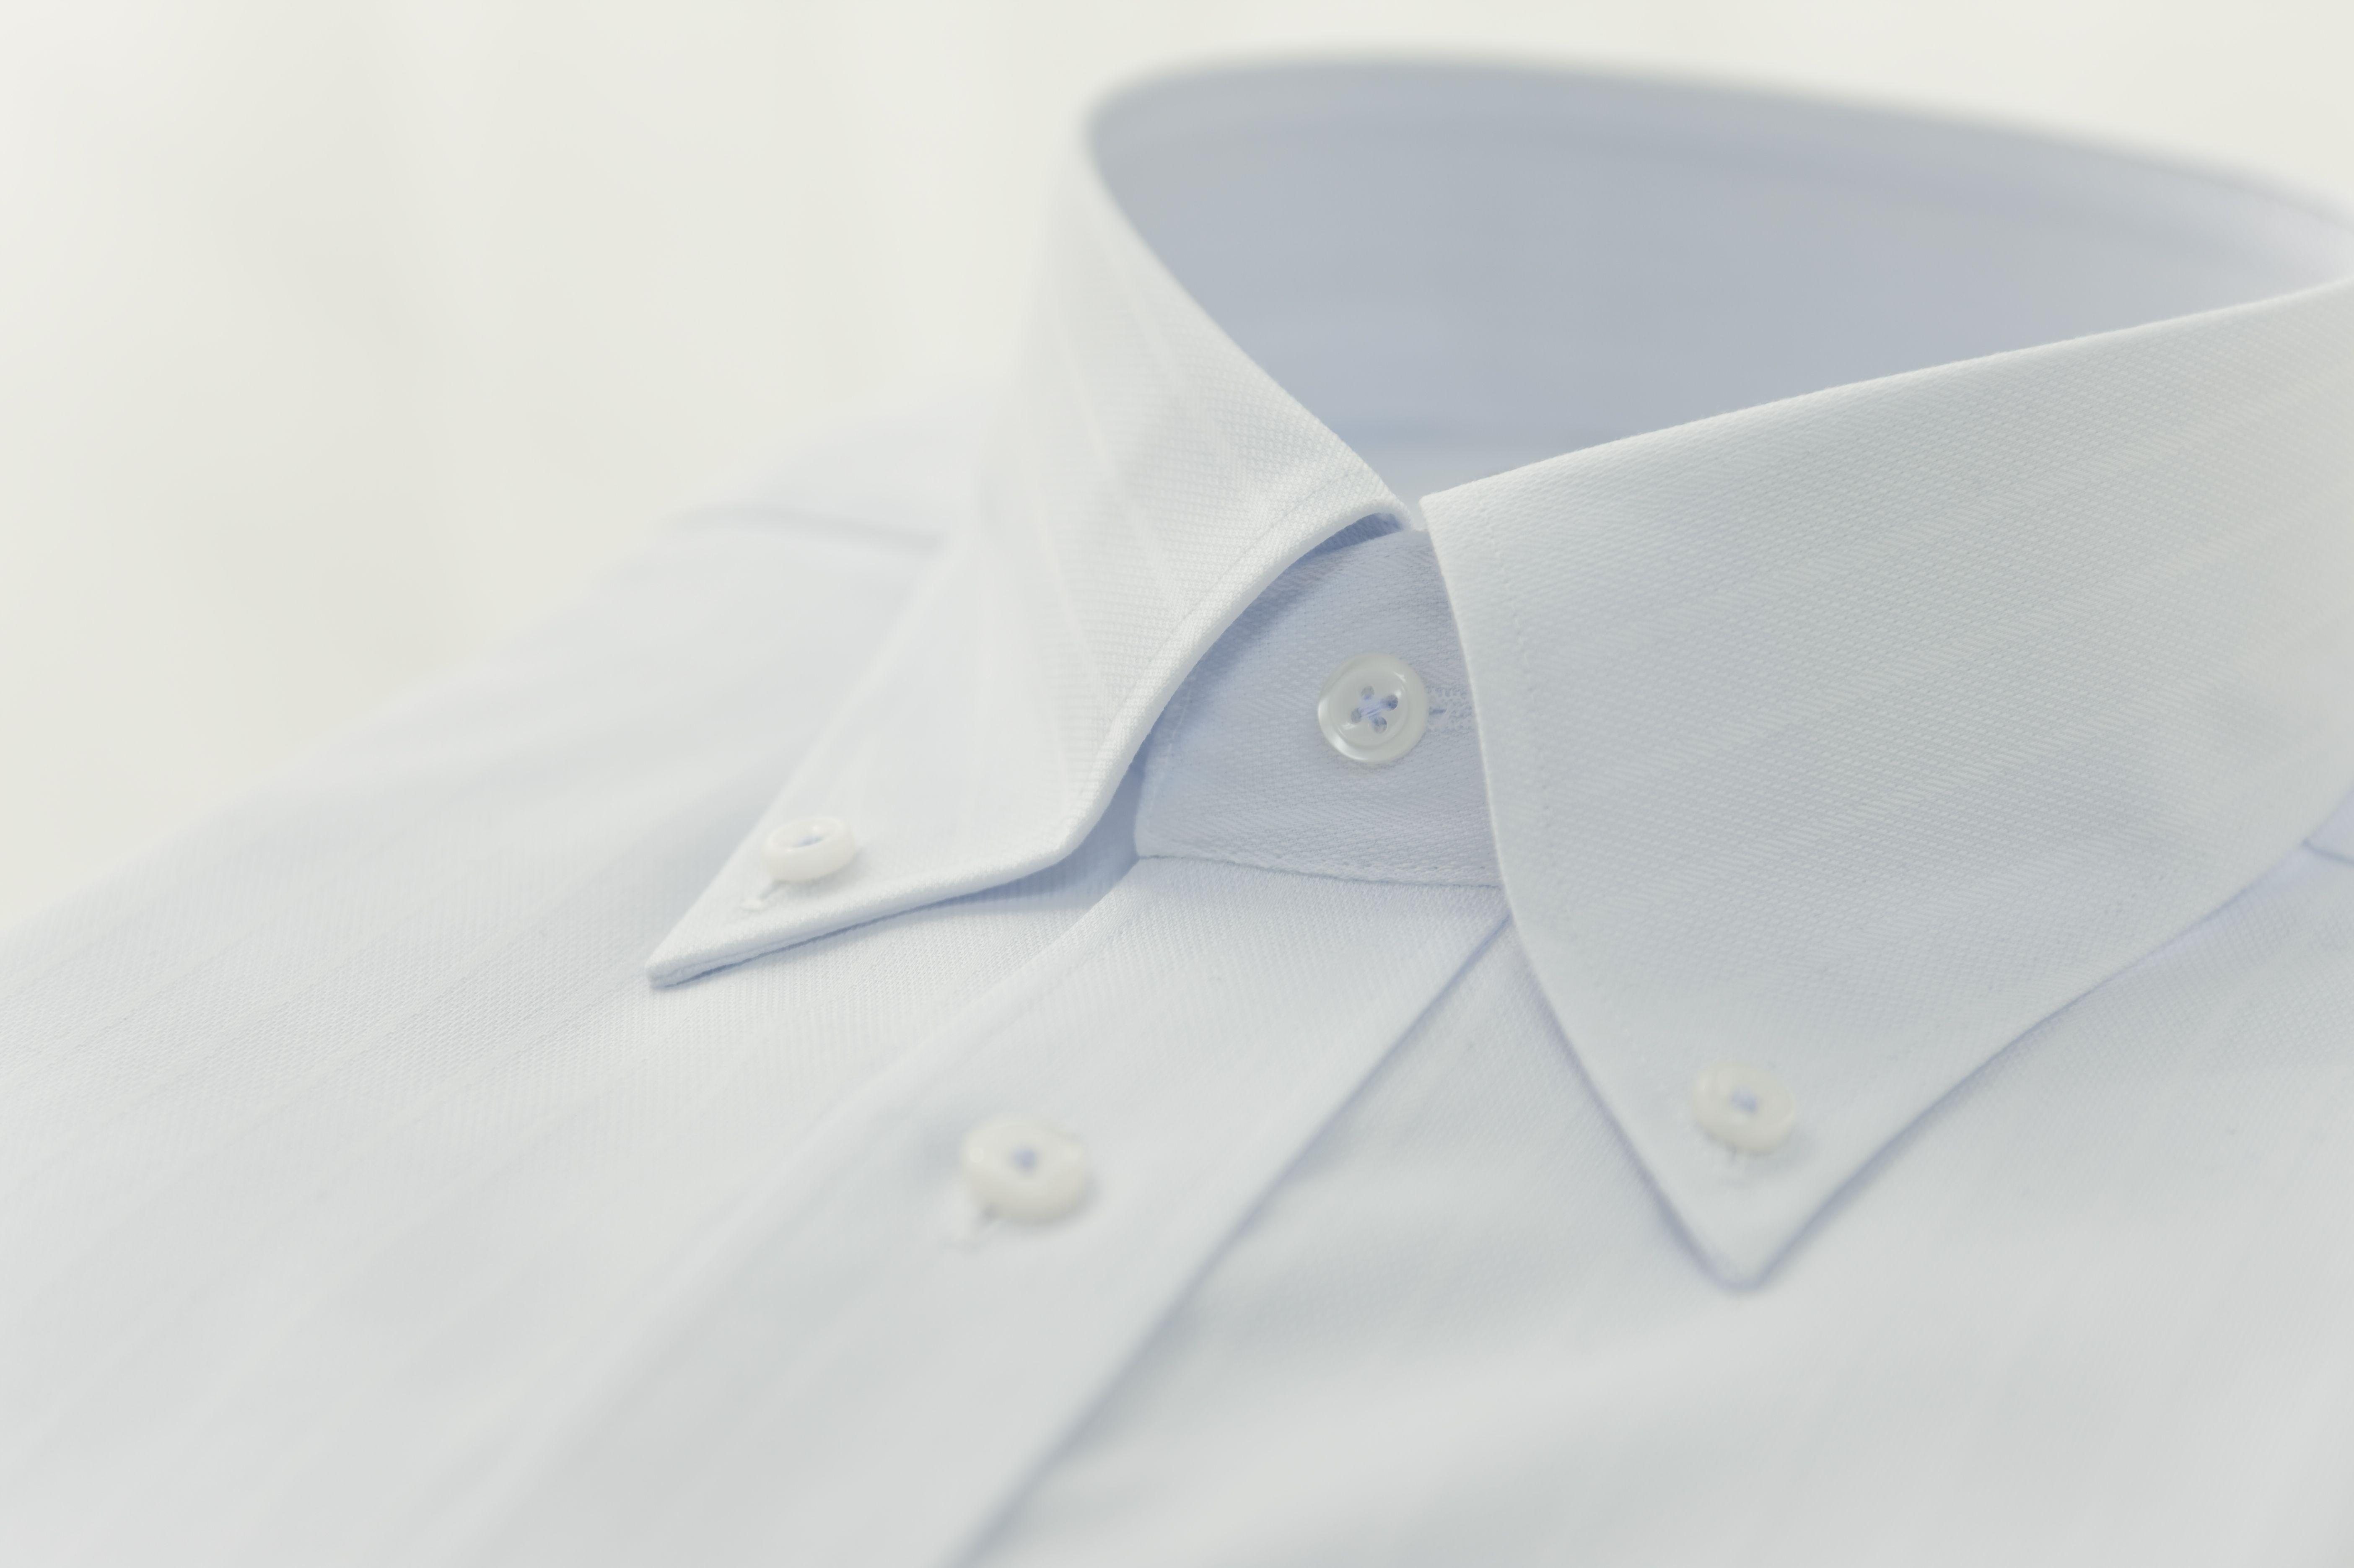 Comprar uniformes escolares en Sevilla